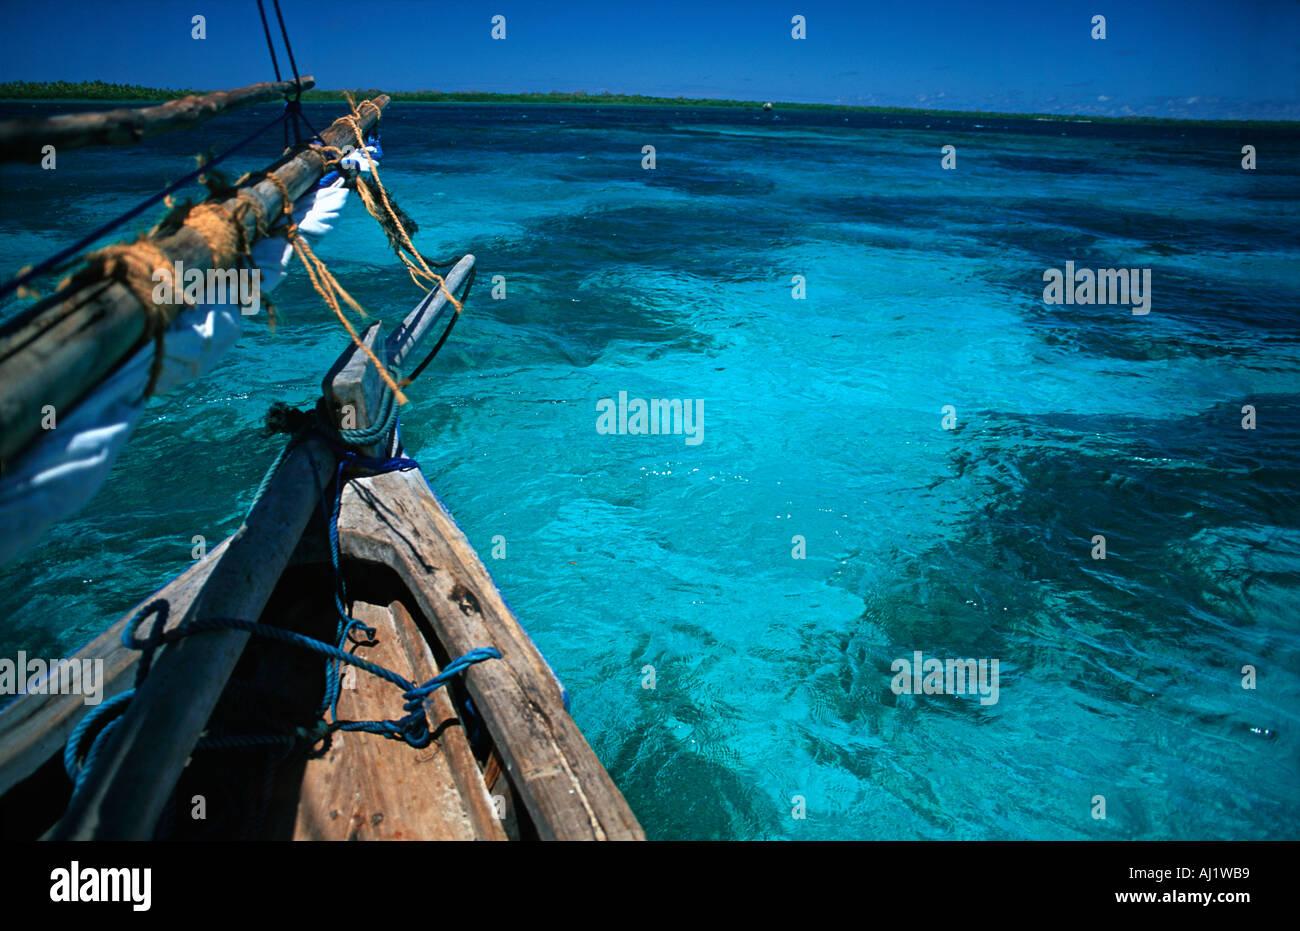 Crystal clear waters between Mafia and Chole island en route to the ruins of Kua on Joani island South of Zanzibar Tanzania - Stock Image